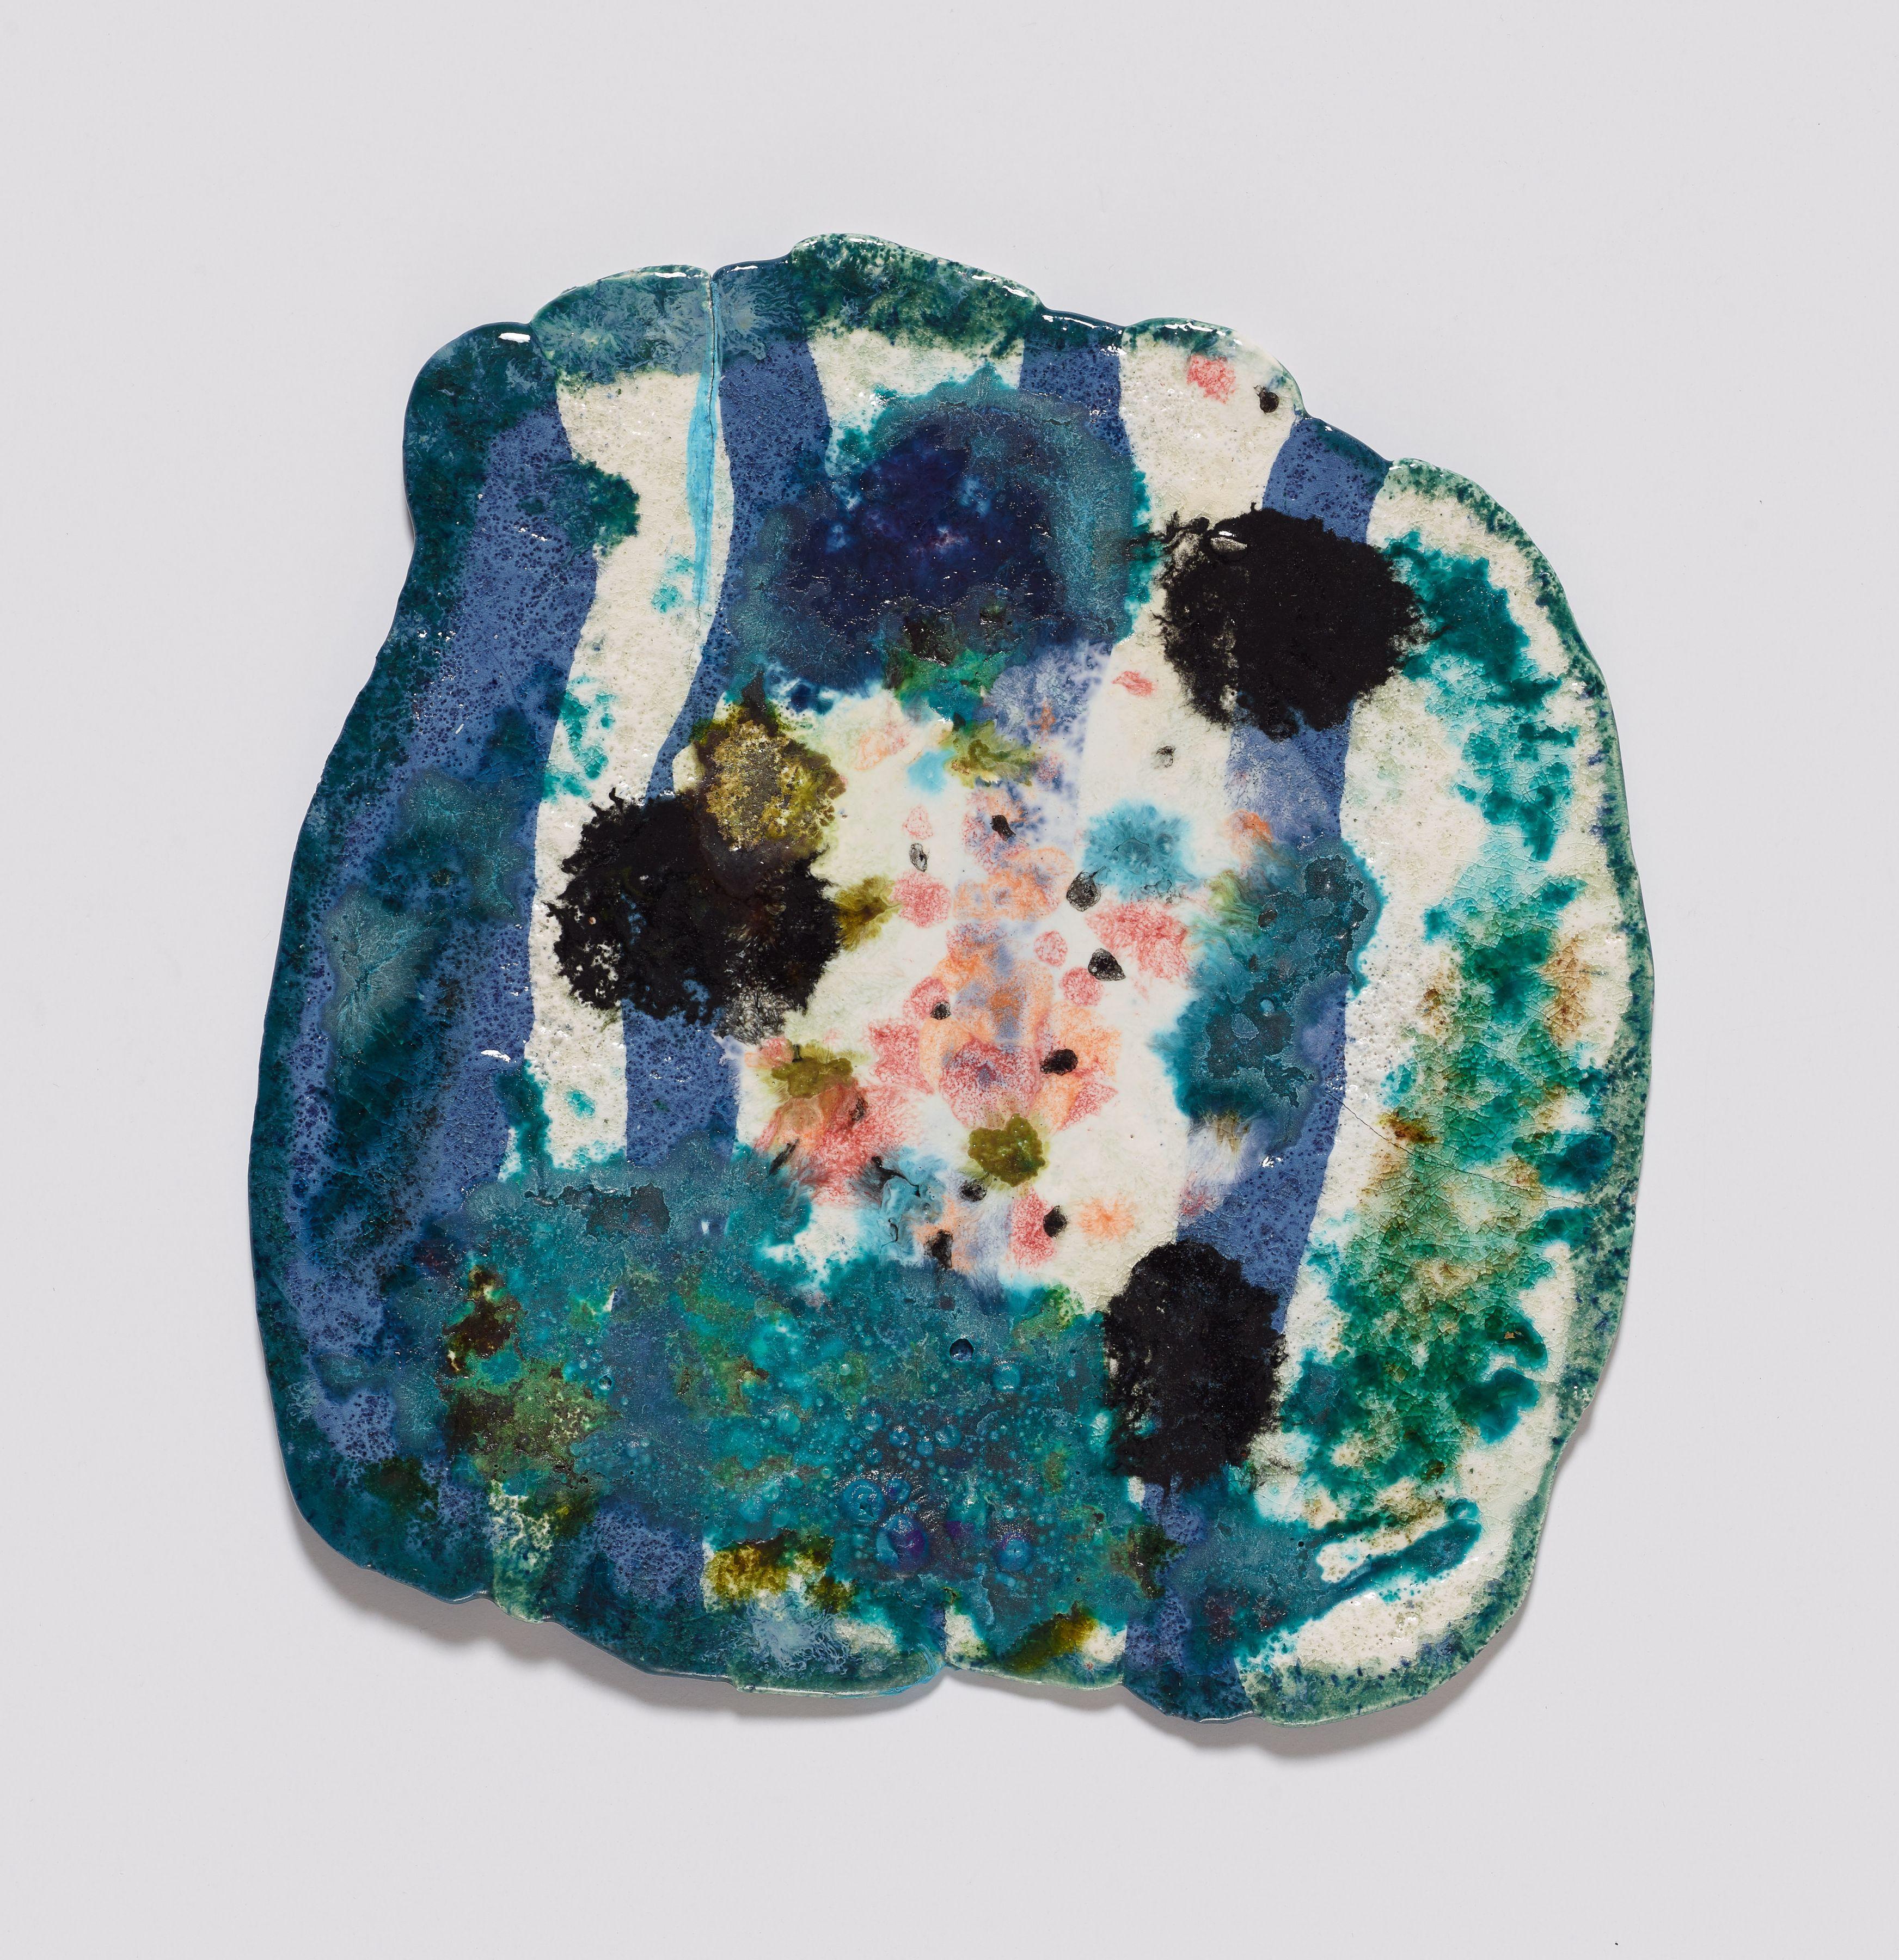 Ilse, 2014, Colored porcelain and glaze